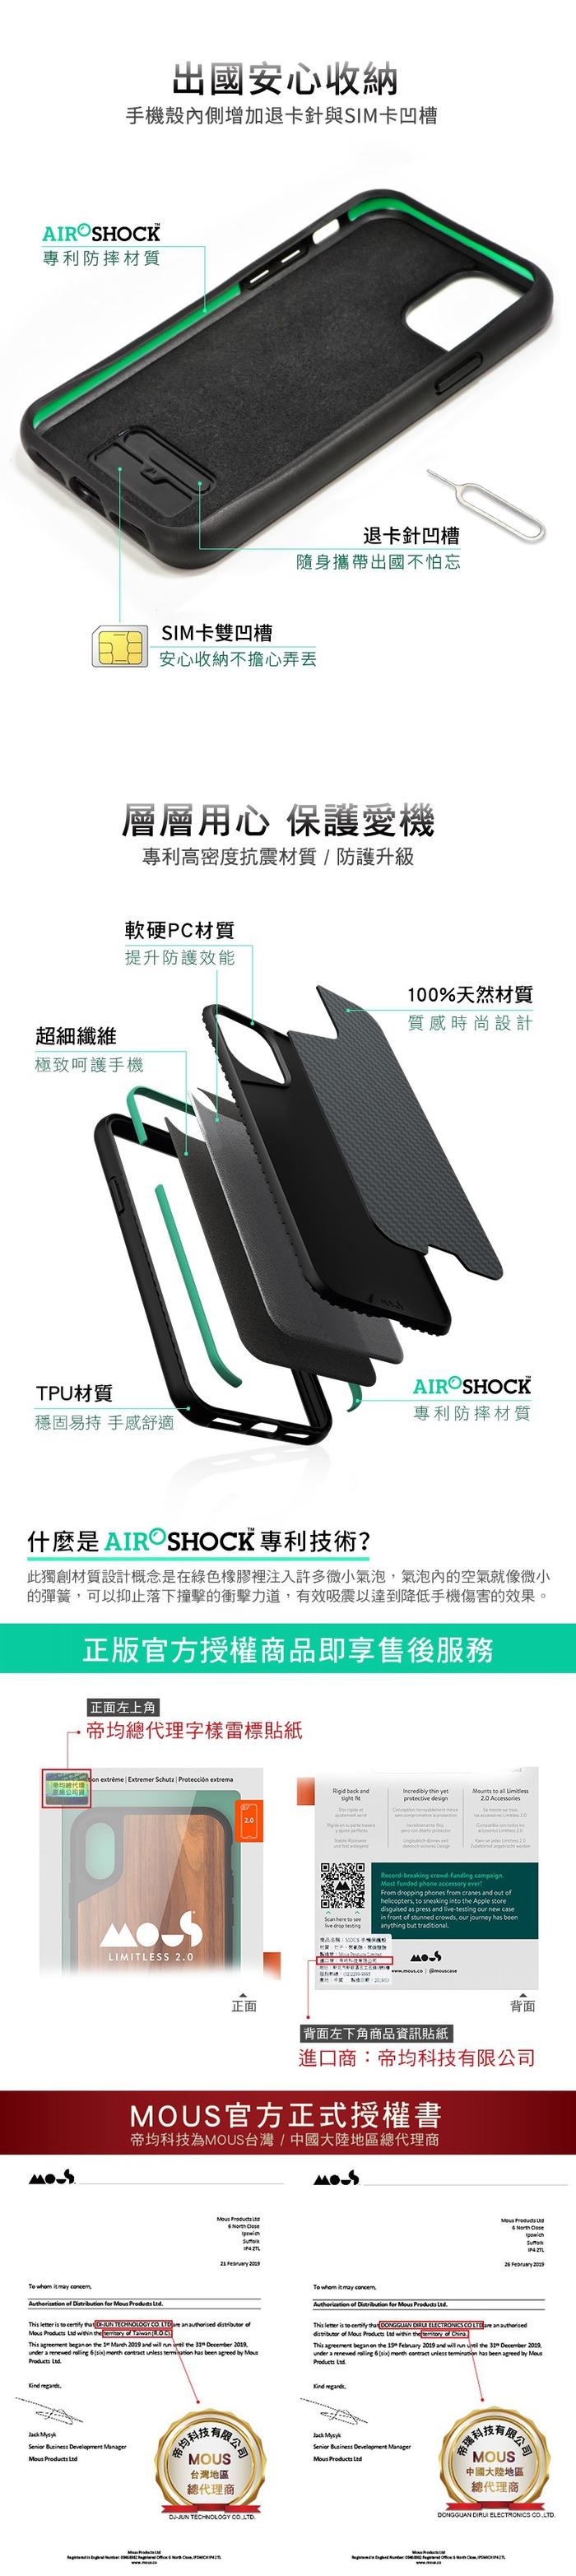 Mous|iPhone AraMax 天然材質防摔保護殼-碳纖維 (iPhone 11Pro / 11 / 11 Pro Max)